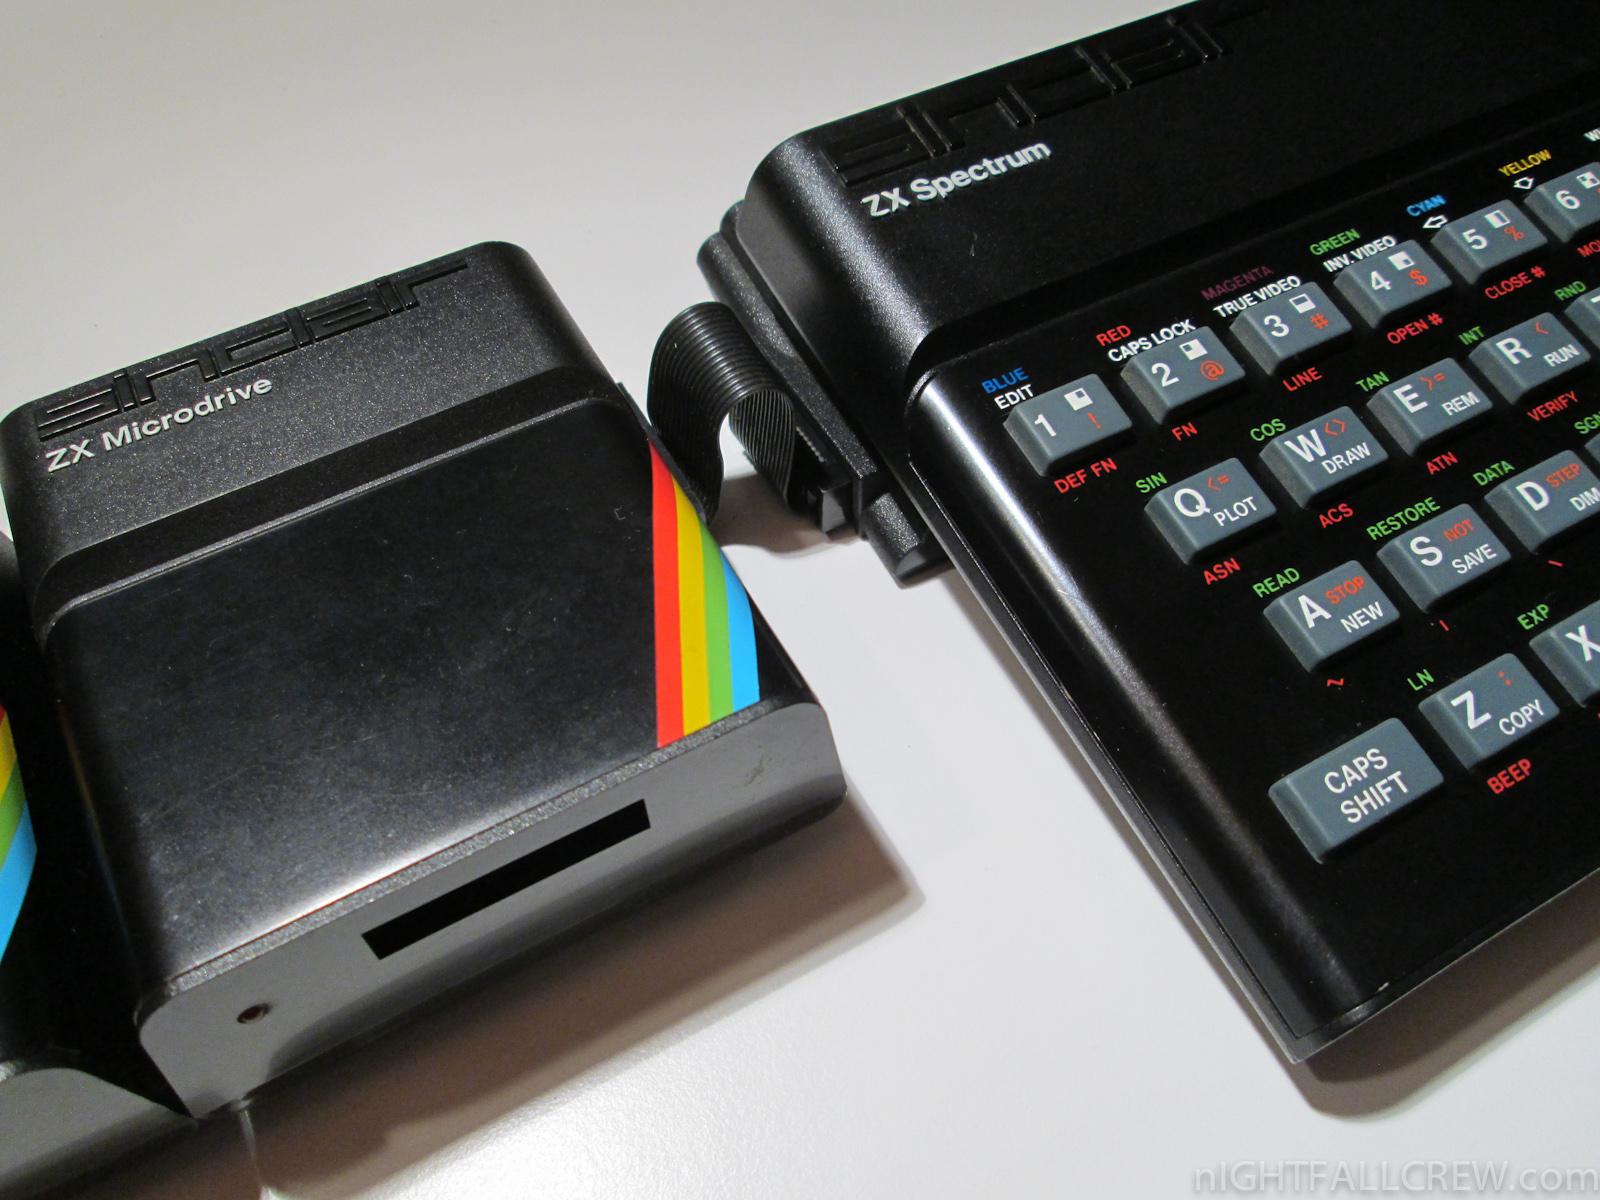 Sinclair Zx Interface 1 Zx Microdrive Nightfall Blog